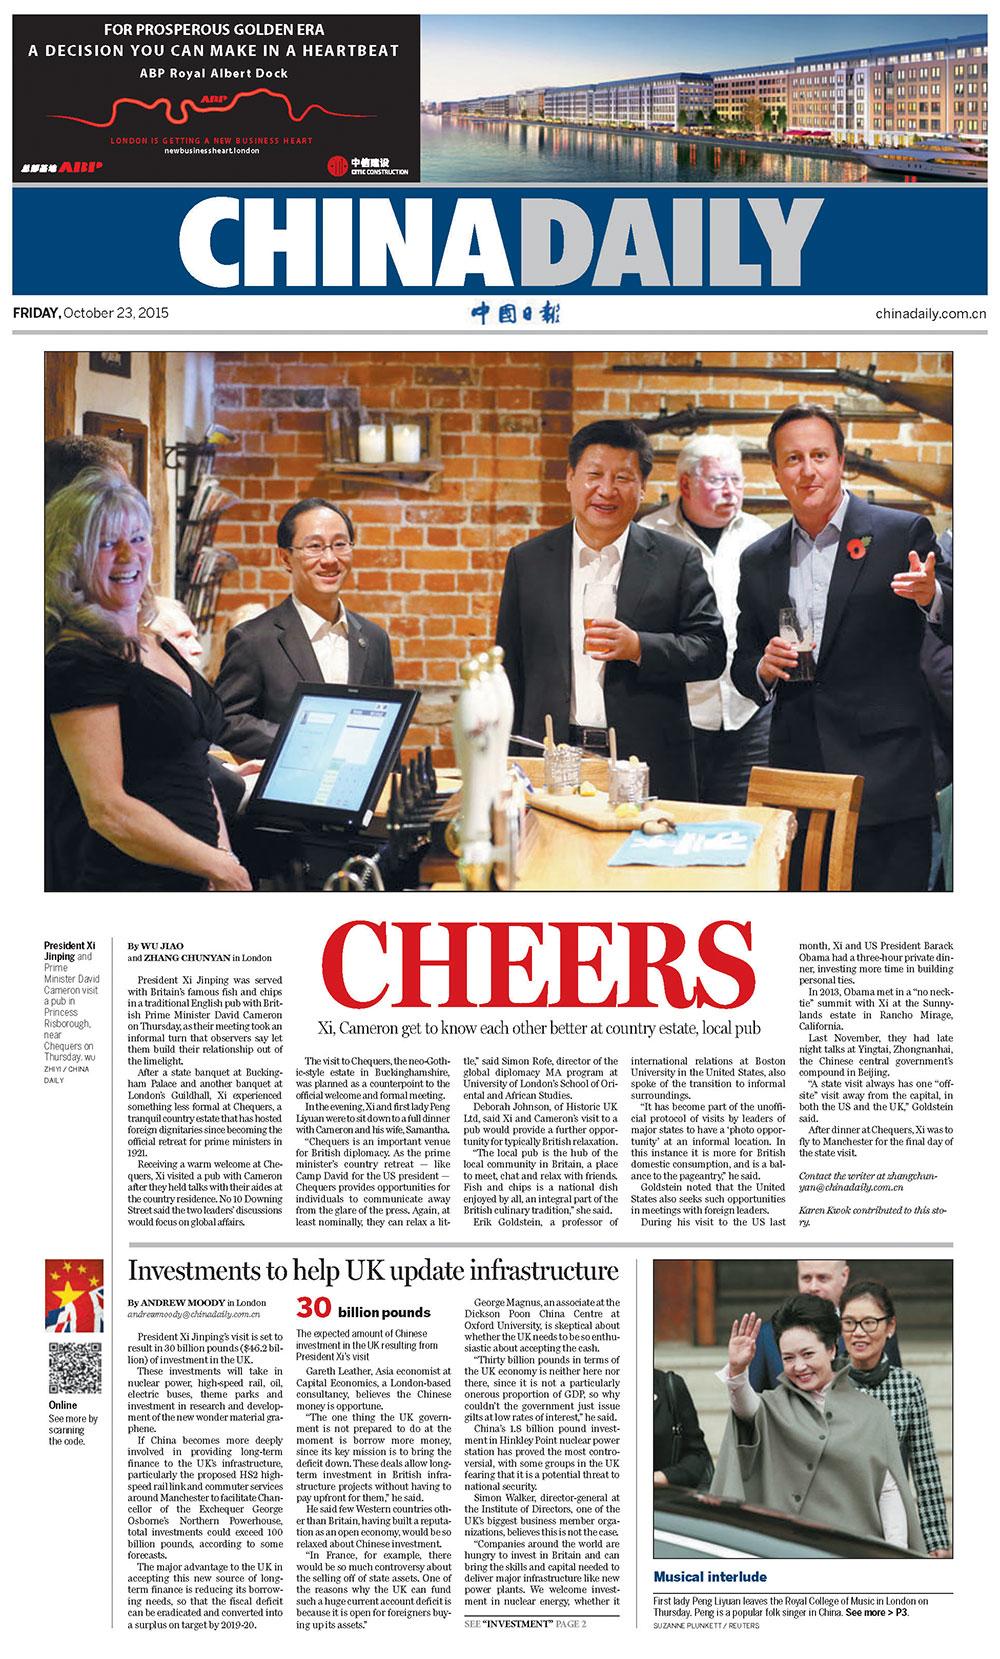 'China Daily,' European edition, October 23, 2015.